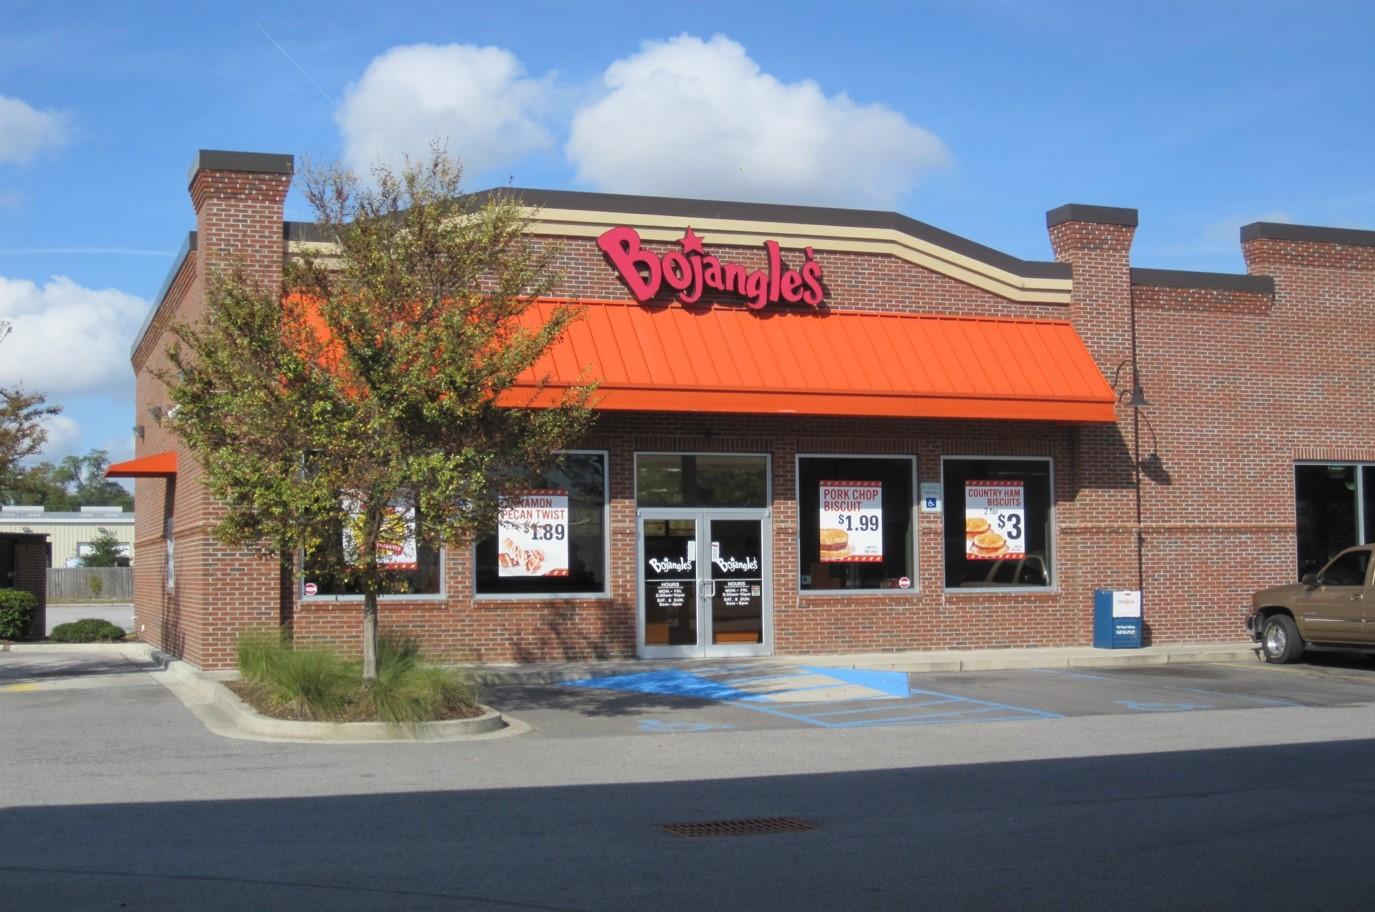 Bojangles' Famous Chicken 'n Biscuits - Opening Soon!, Lewisburg TN